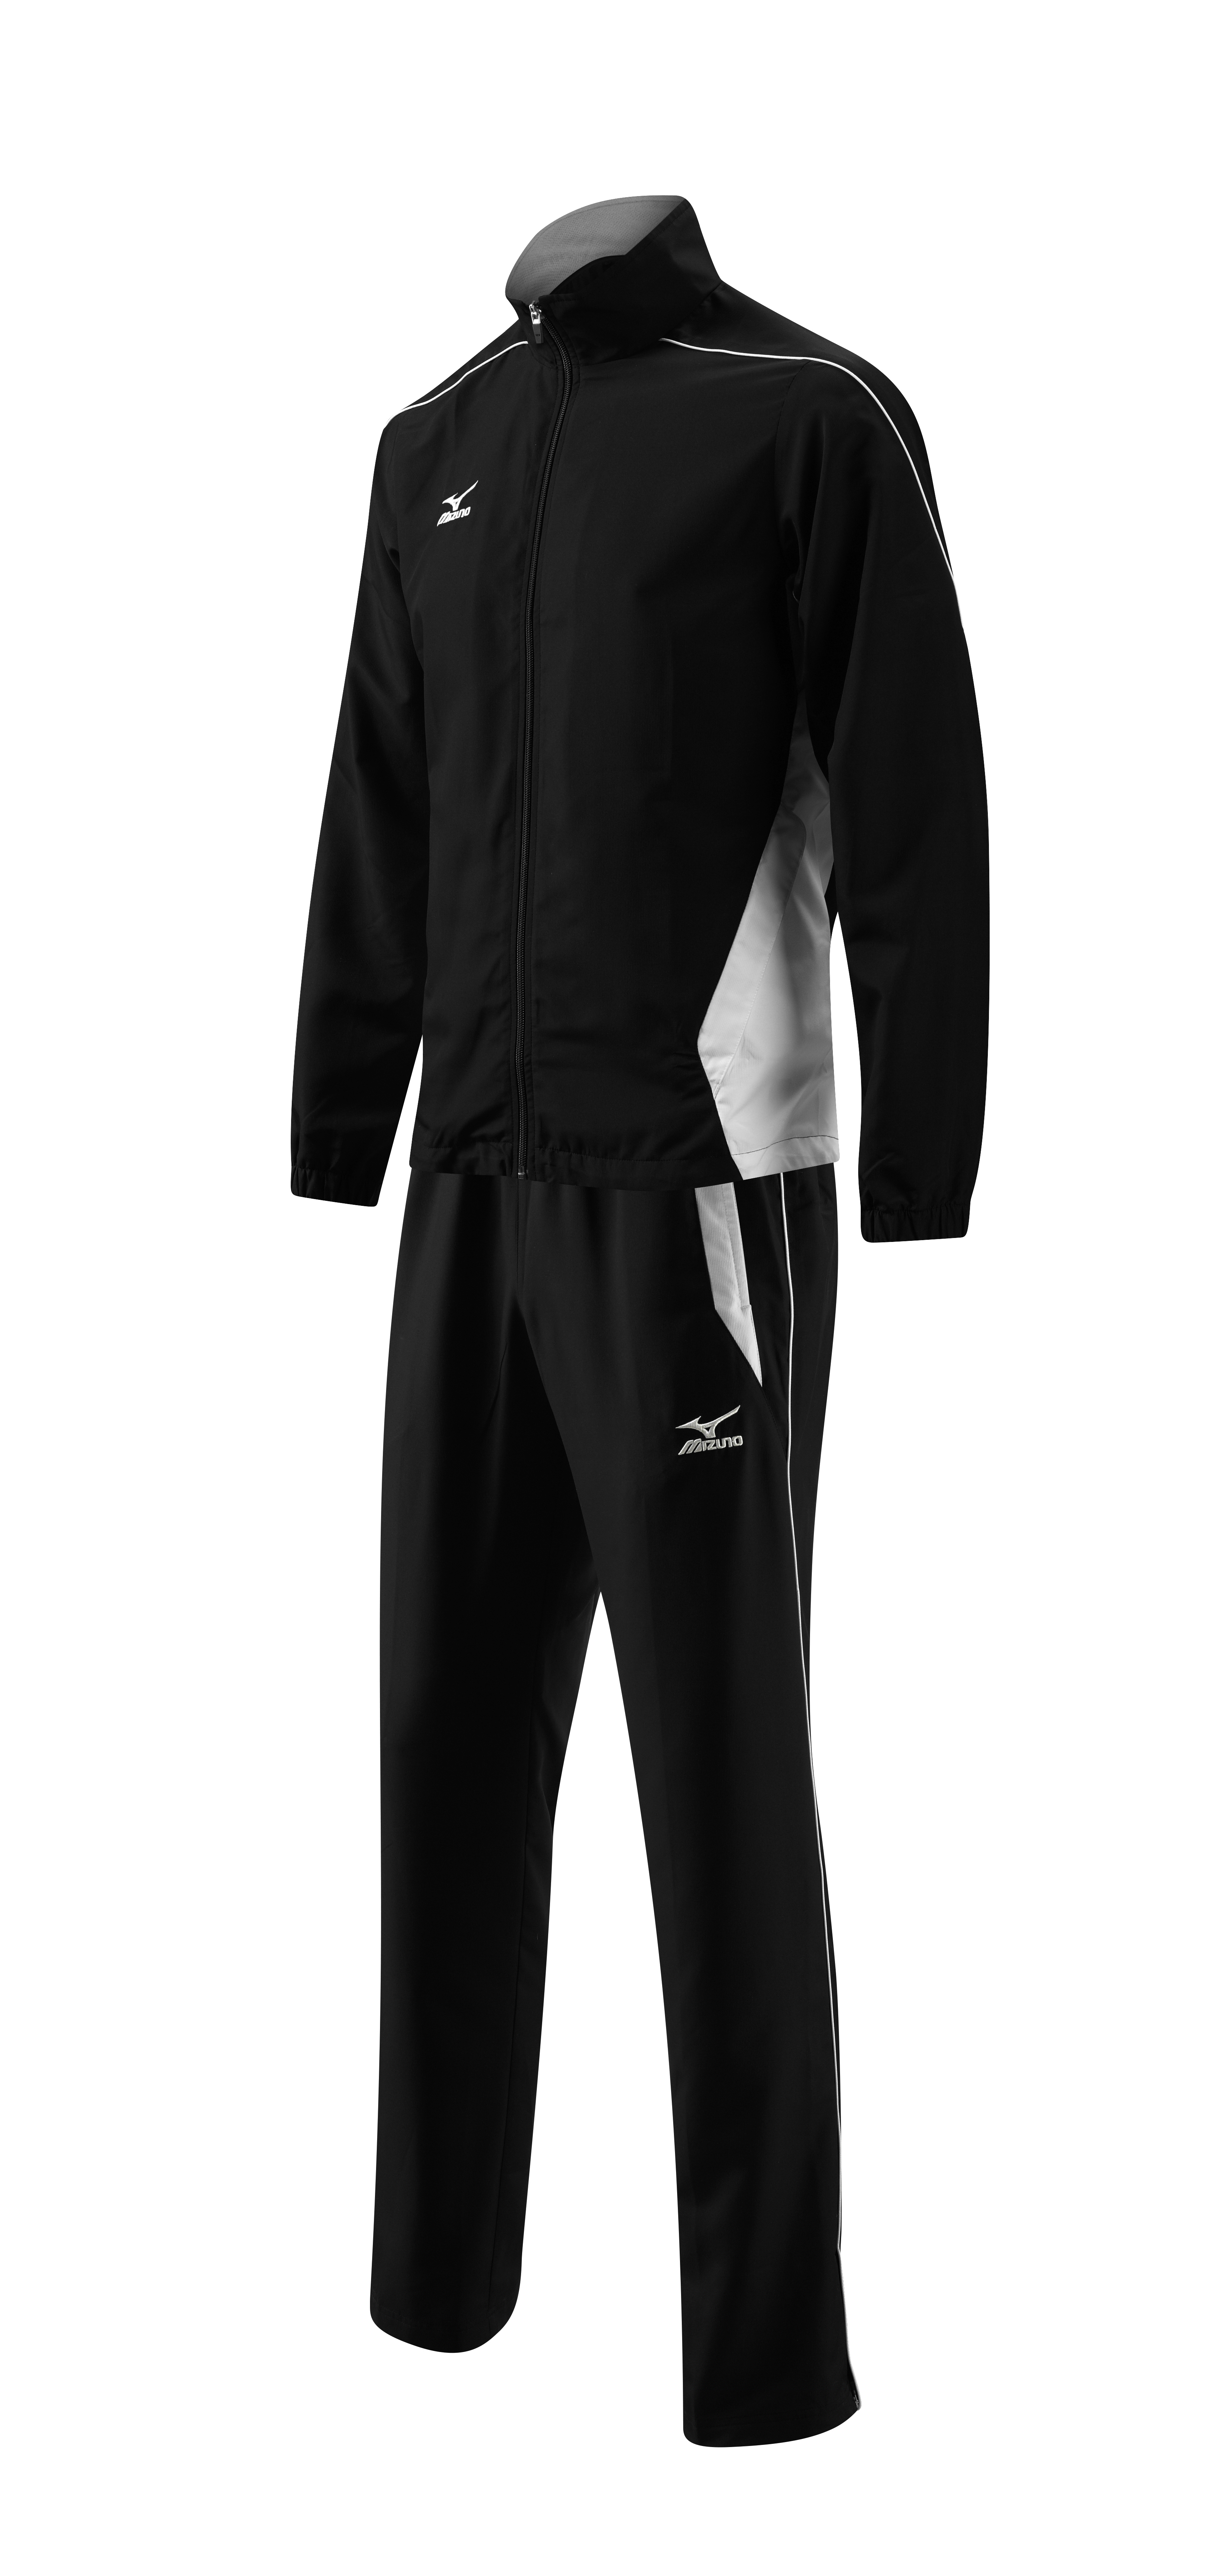 Mizuno Woven Track Suit 401 K2EG4A0109 L